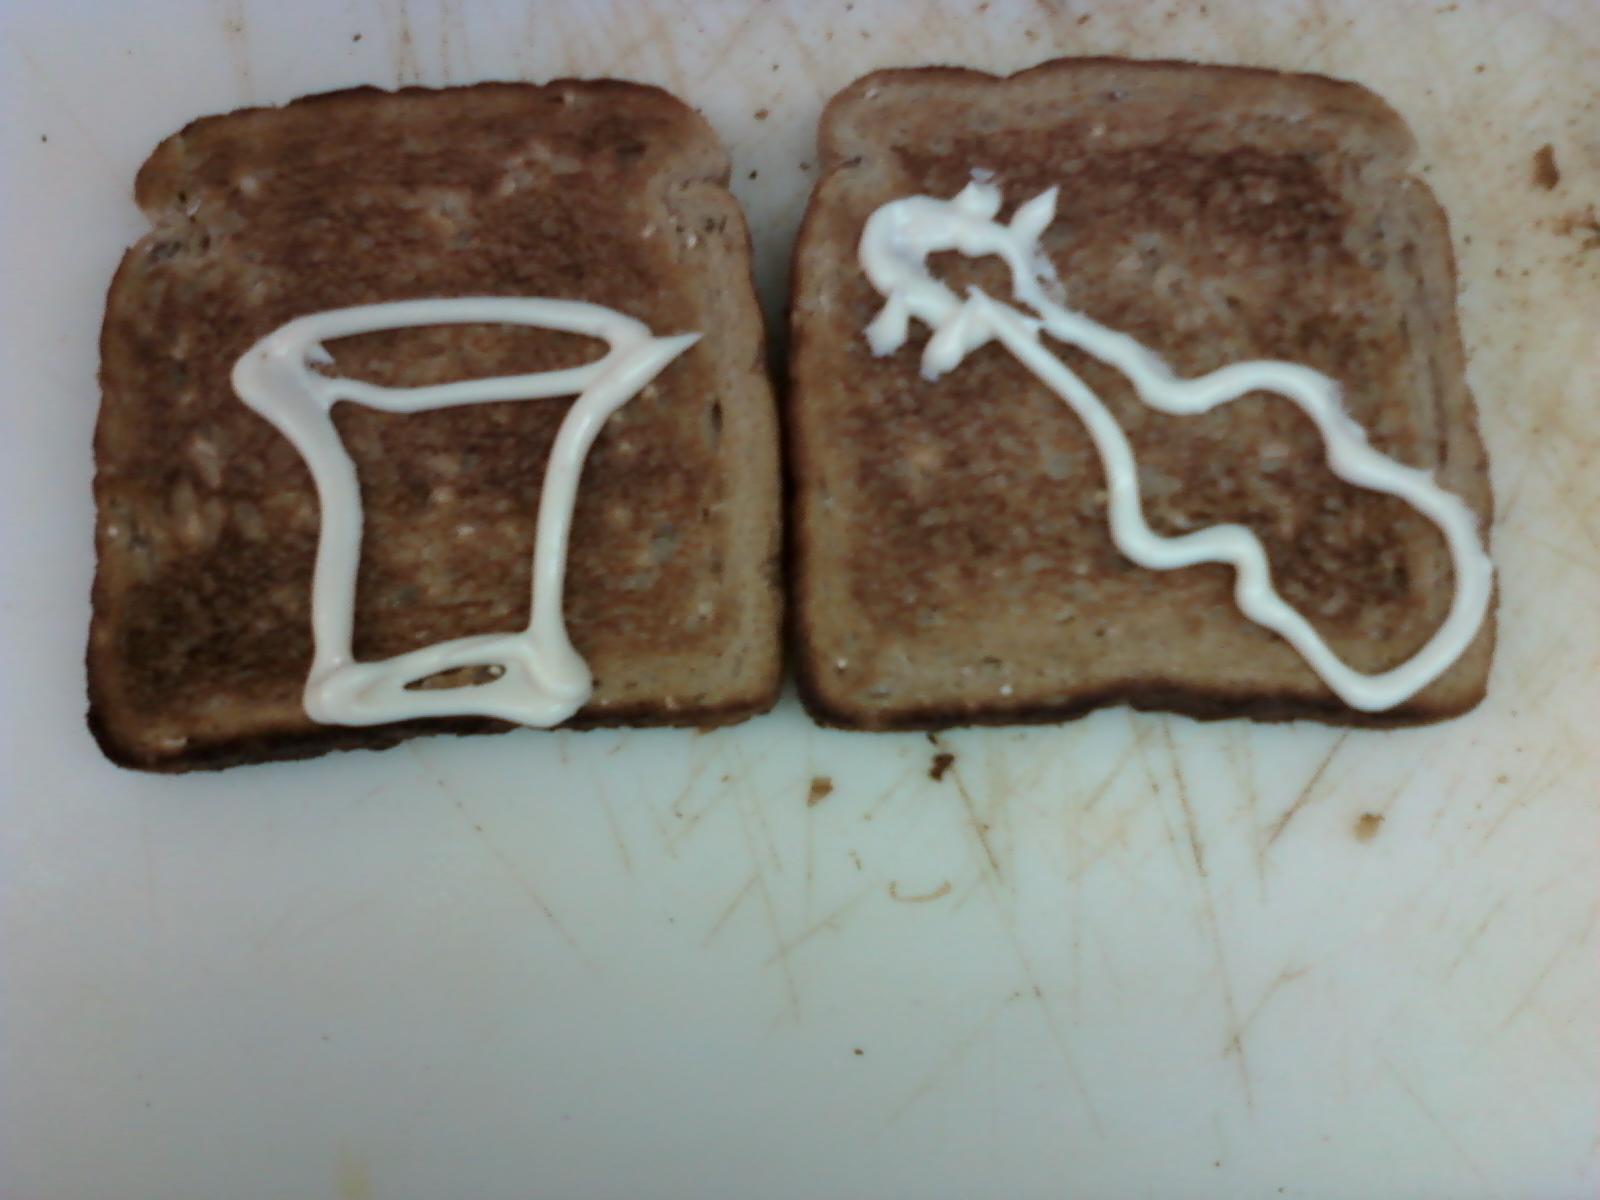 sandwich_art/0919111051.jpg